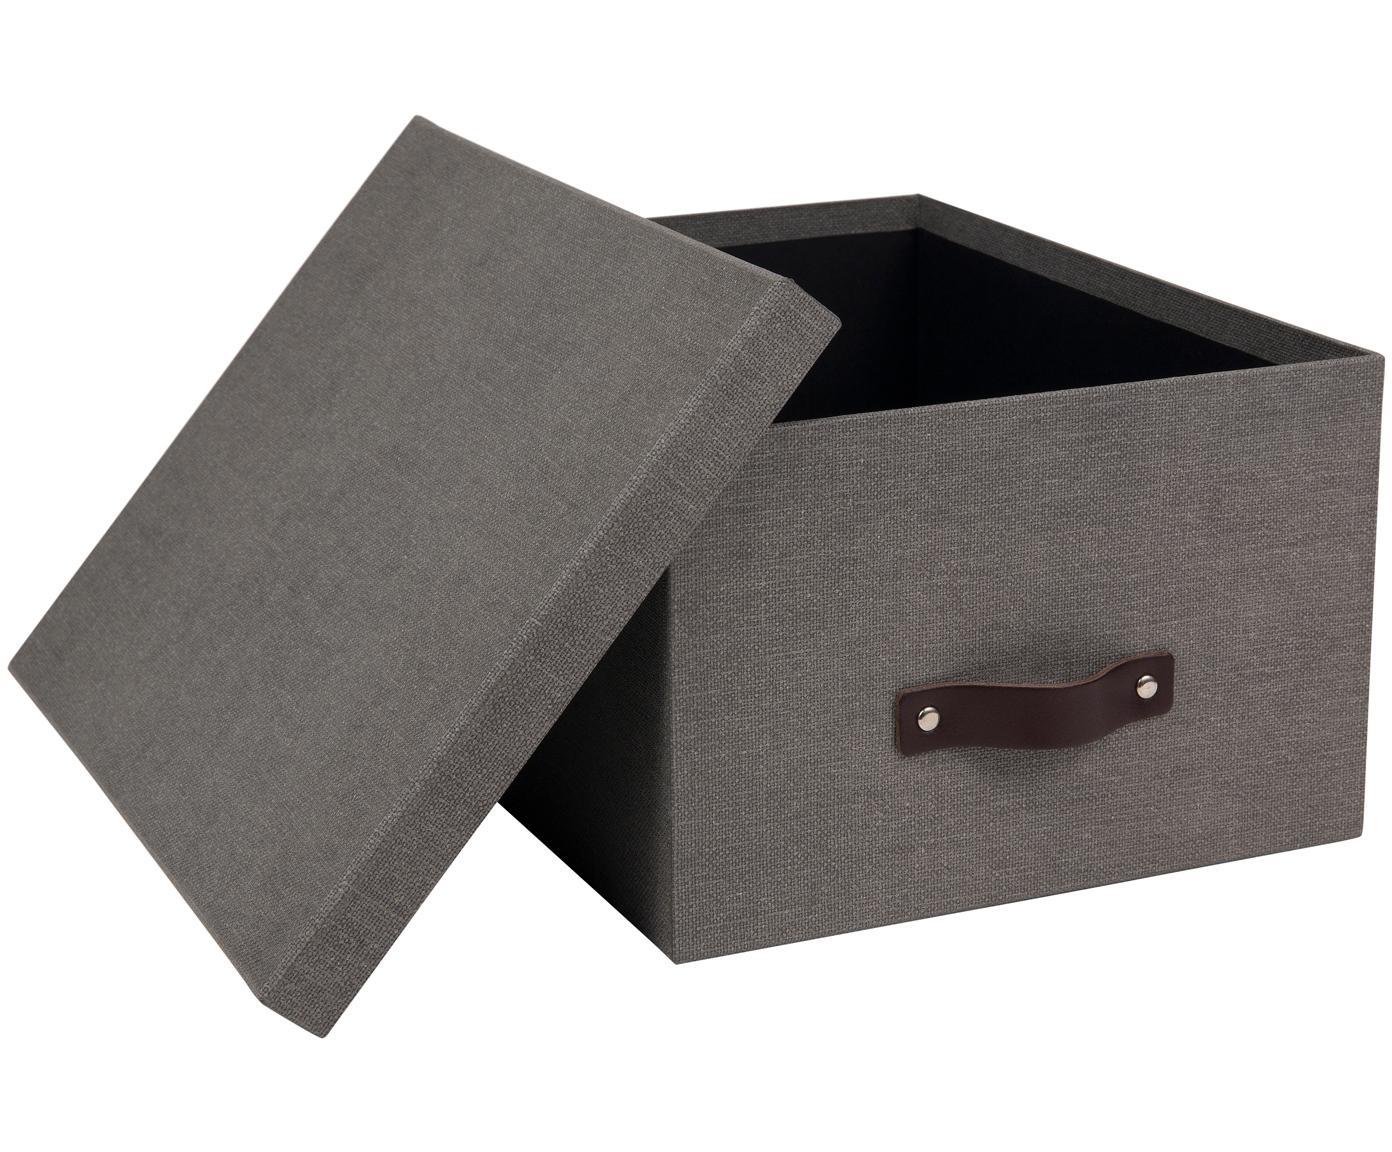 Aufbewahrungsbox Gustav II, Box: Fester, laminierter Karto, Griff: Leder, Grau, 30 x 15 cm